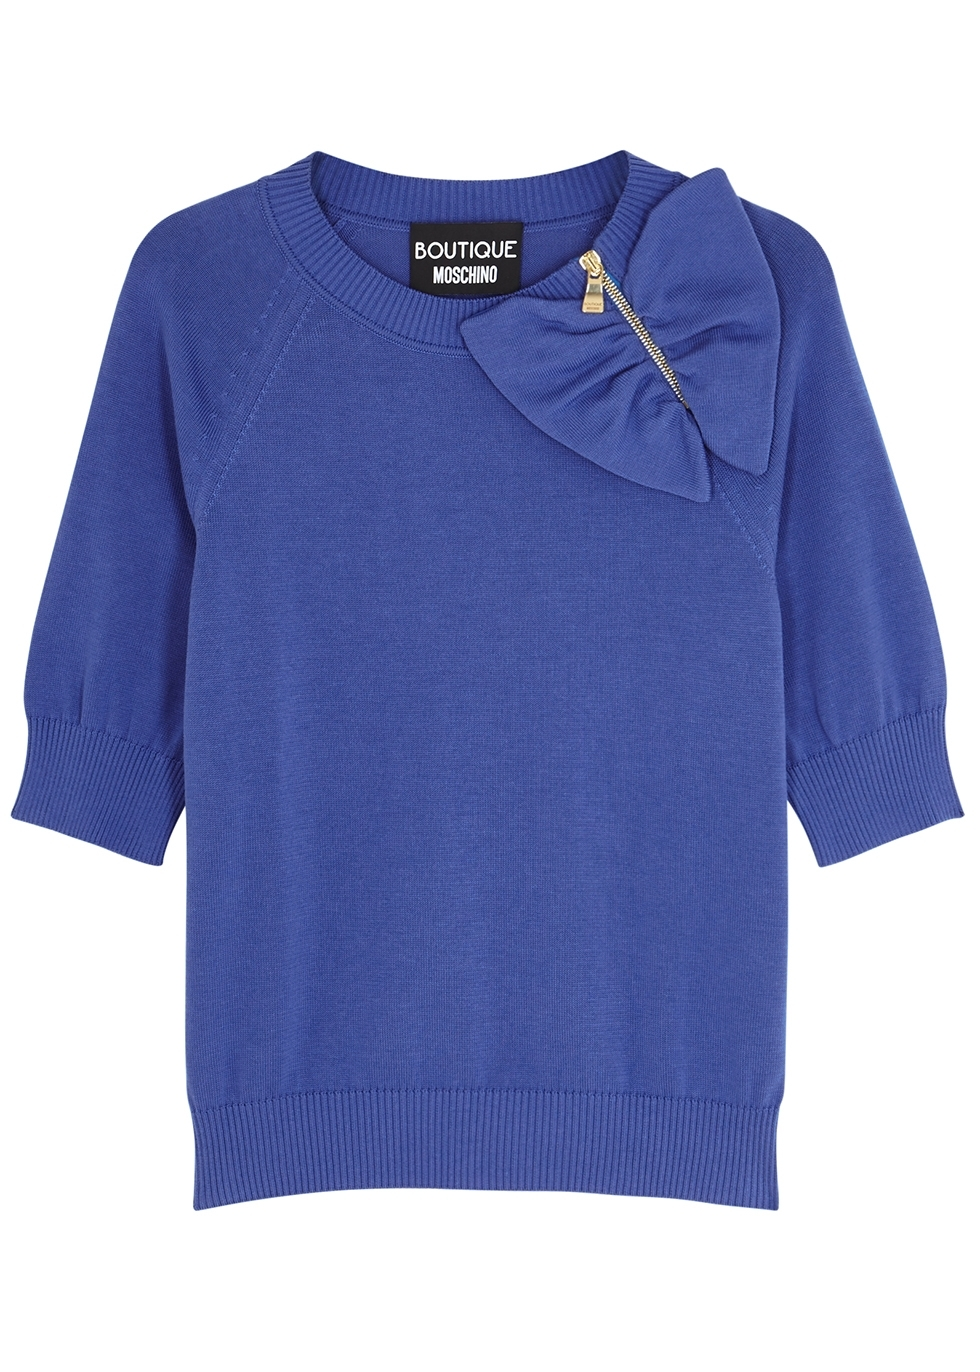 82824feb322 Boutique Moschino - Italian Designer Brands - Harvey Nichols